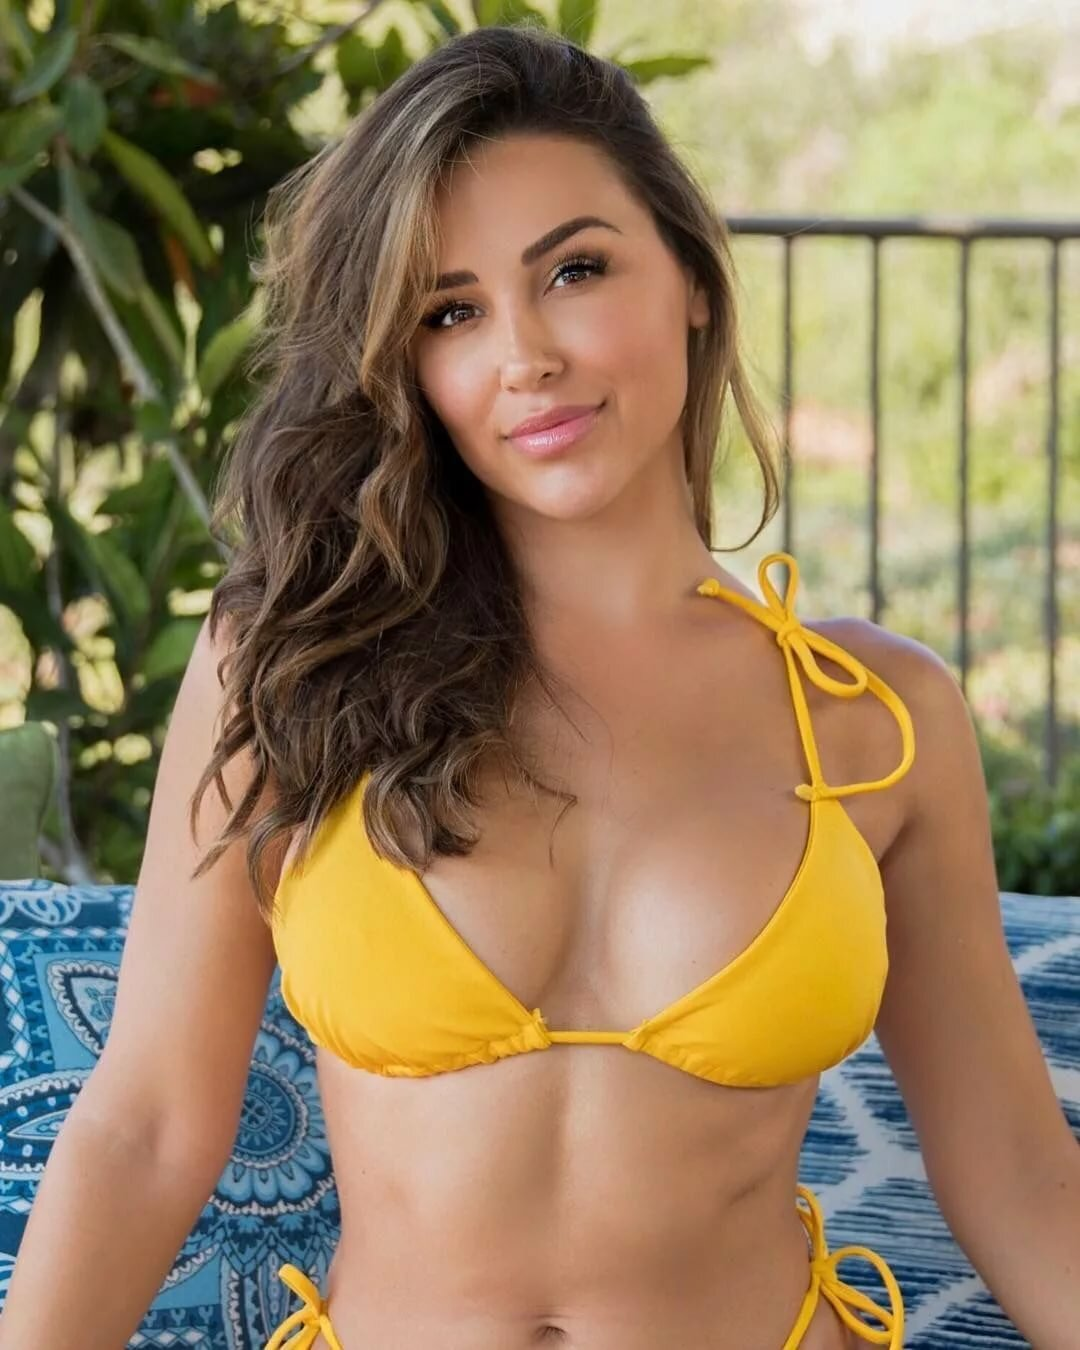 Petite latina porn stars